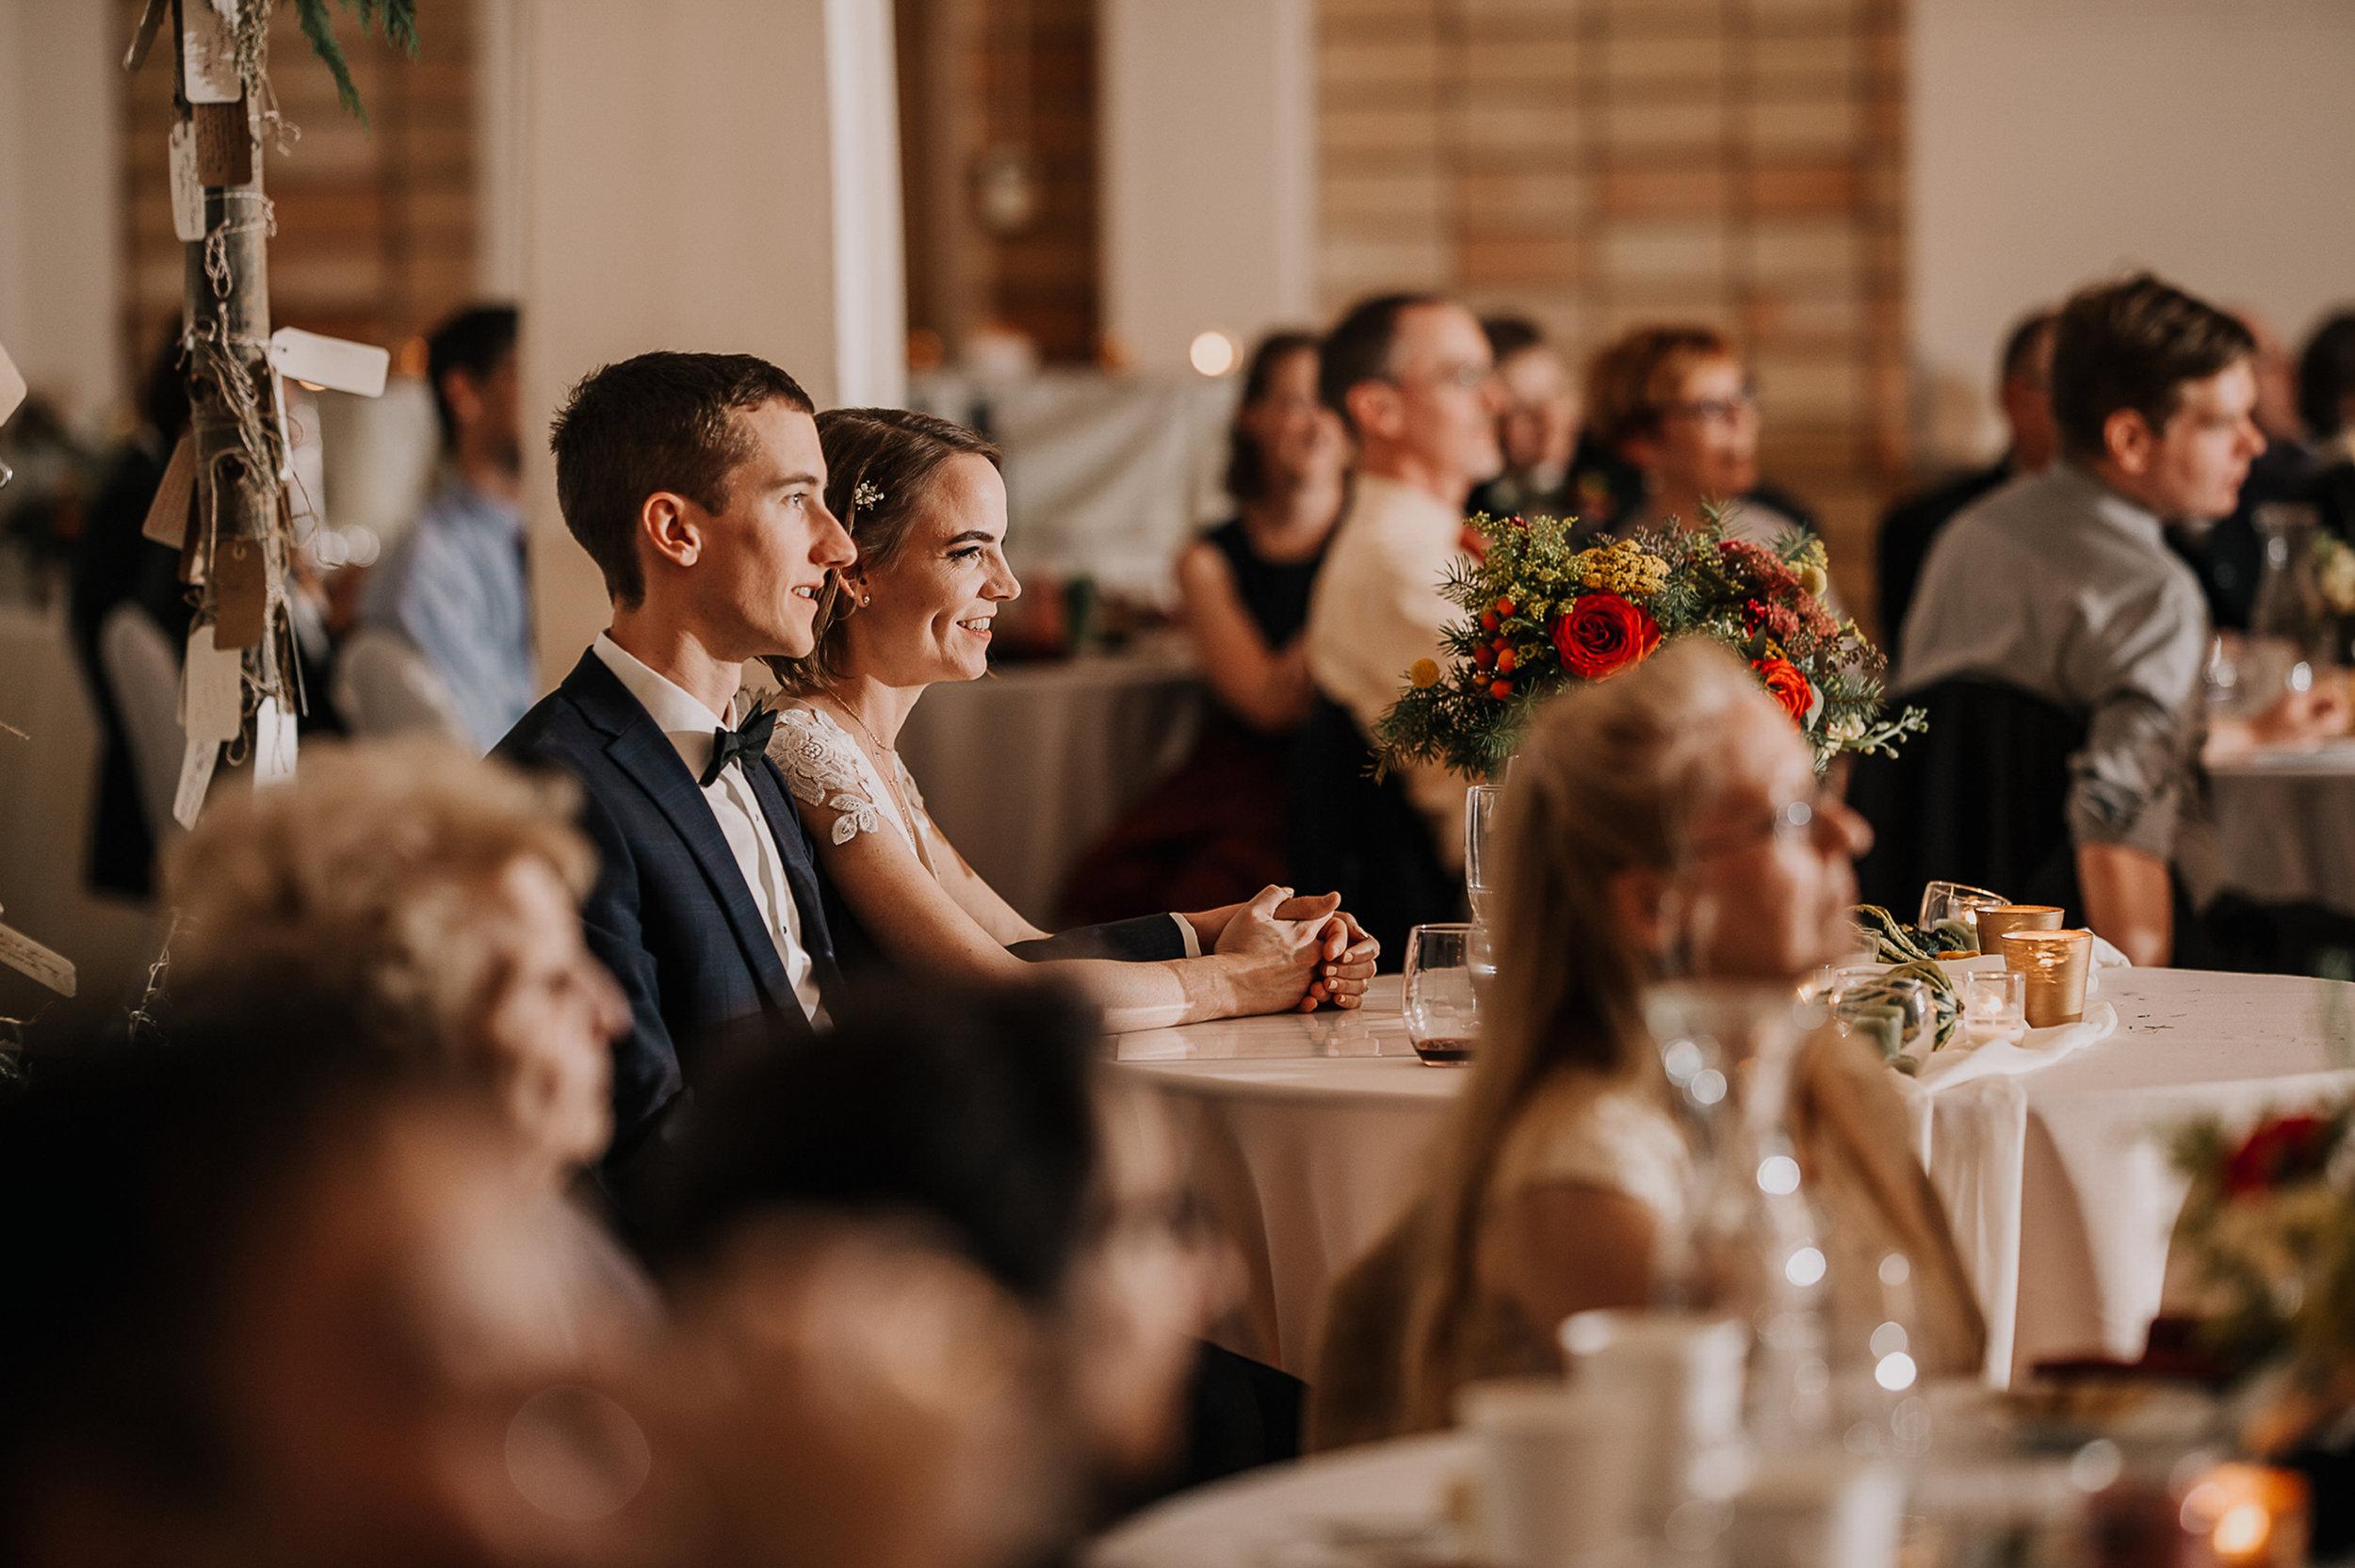 1138Fall Wedding_Maroon Wedding_Billings Wedding Photographer_Emma + Dan_October 20, 2018-2998.jpg